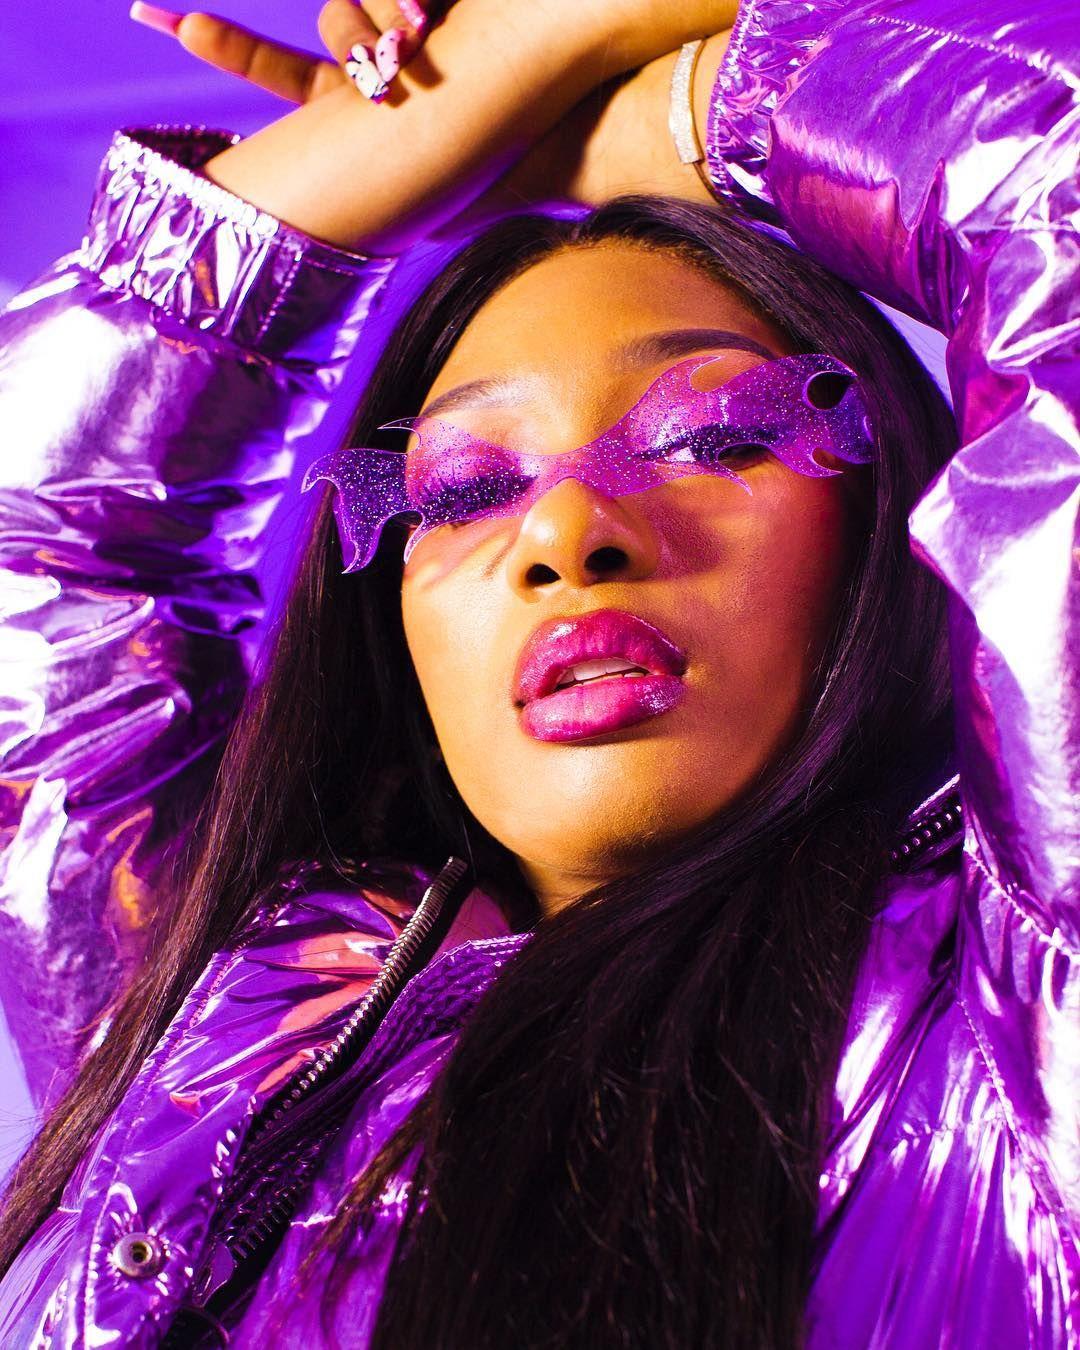 𝕸𝖚𝖓𝖆𝖈𝖍𝖎 𝕺𝖘𝖊𝖌𝖇𝖚 On Instagram Theestallion For Refinery29 Mua Mimiquiquine Hair A Dark Purple Aesthetic Purple Aesthetic Pastel Pink Aesthetic